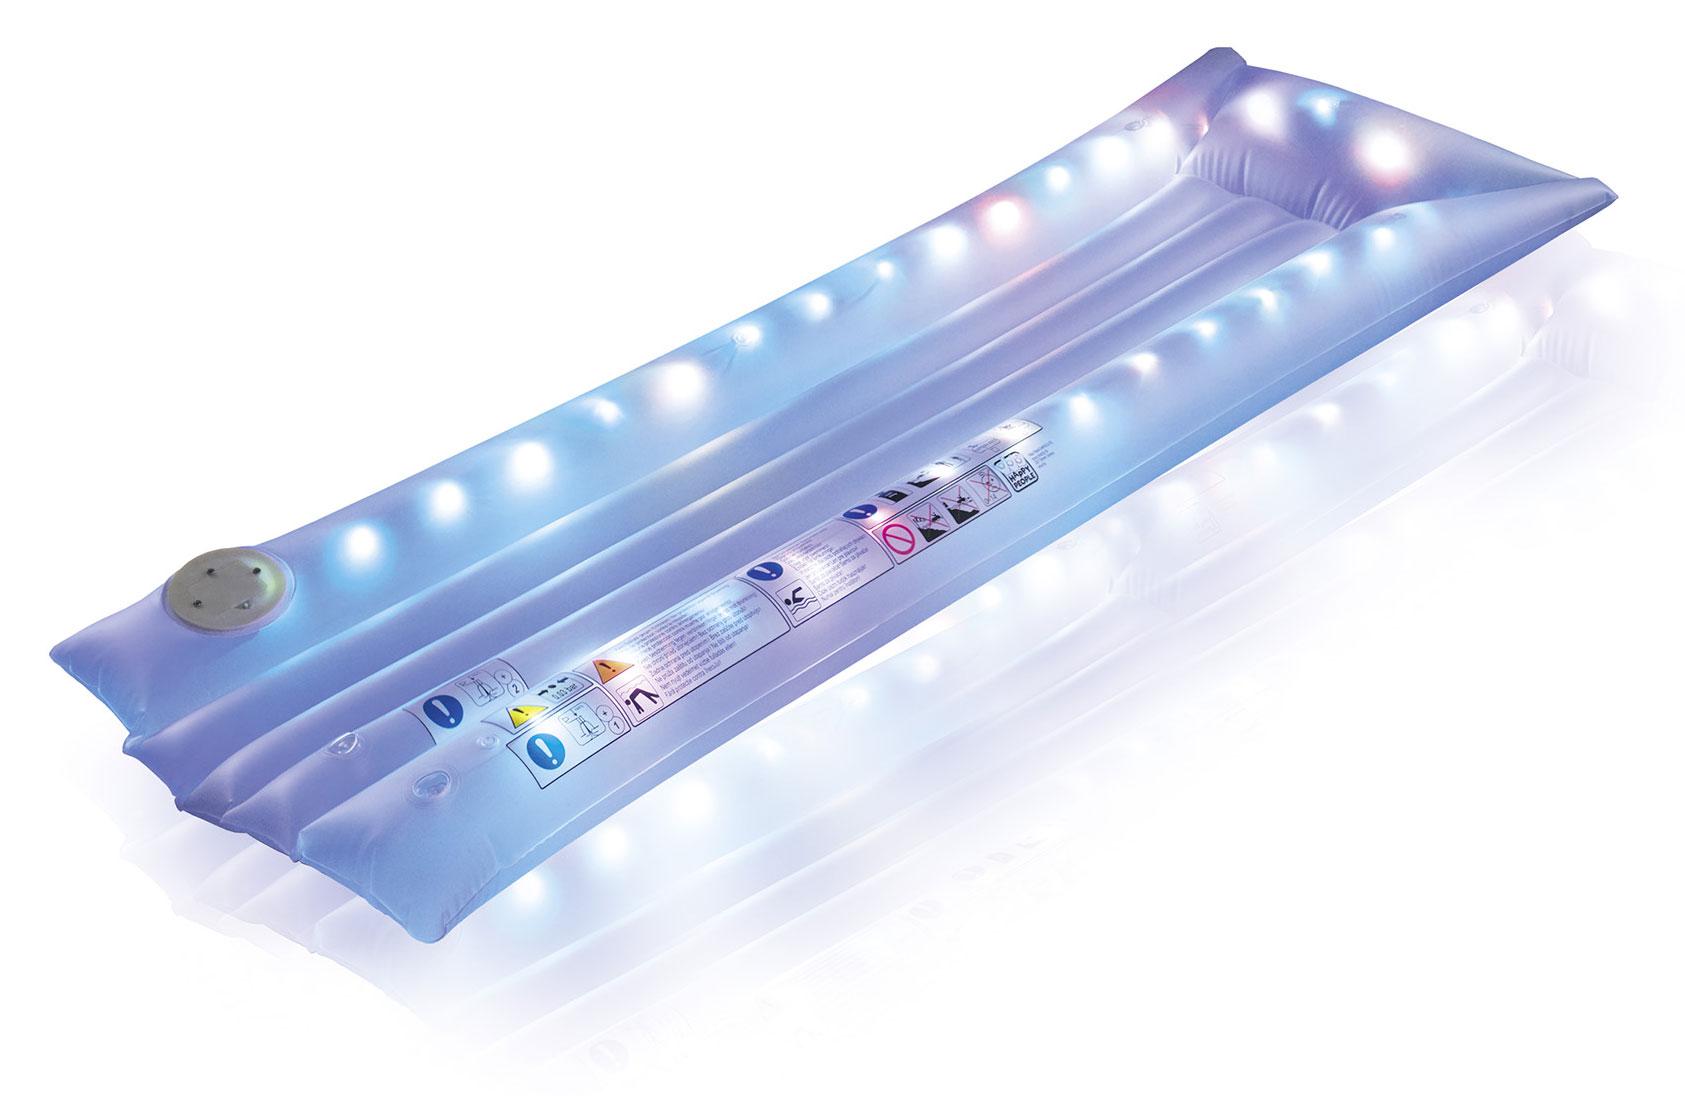 Luftmatratze / Wassermatratze LED 172x68x14cm Happy People 77651 Bild 1